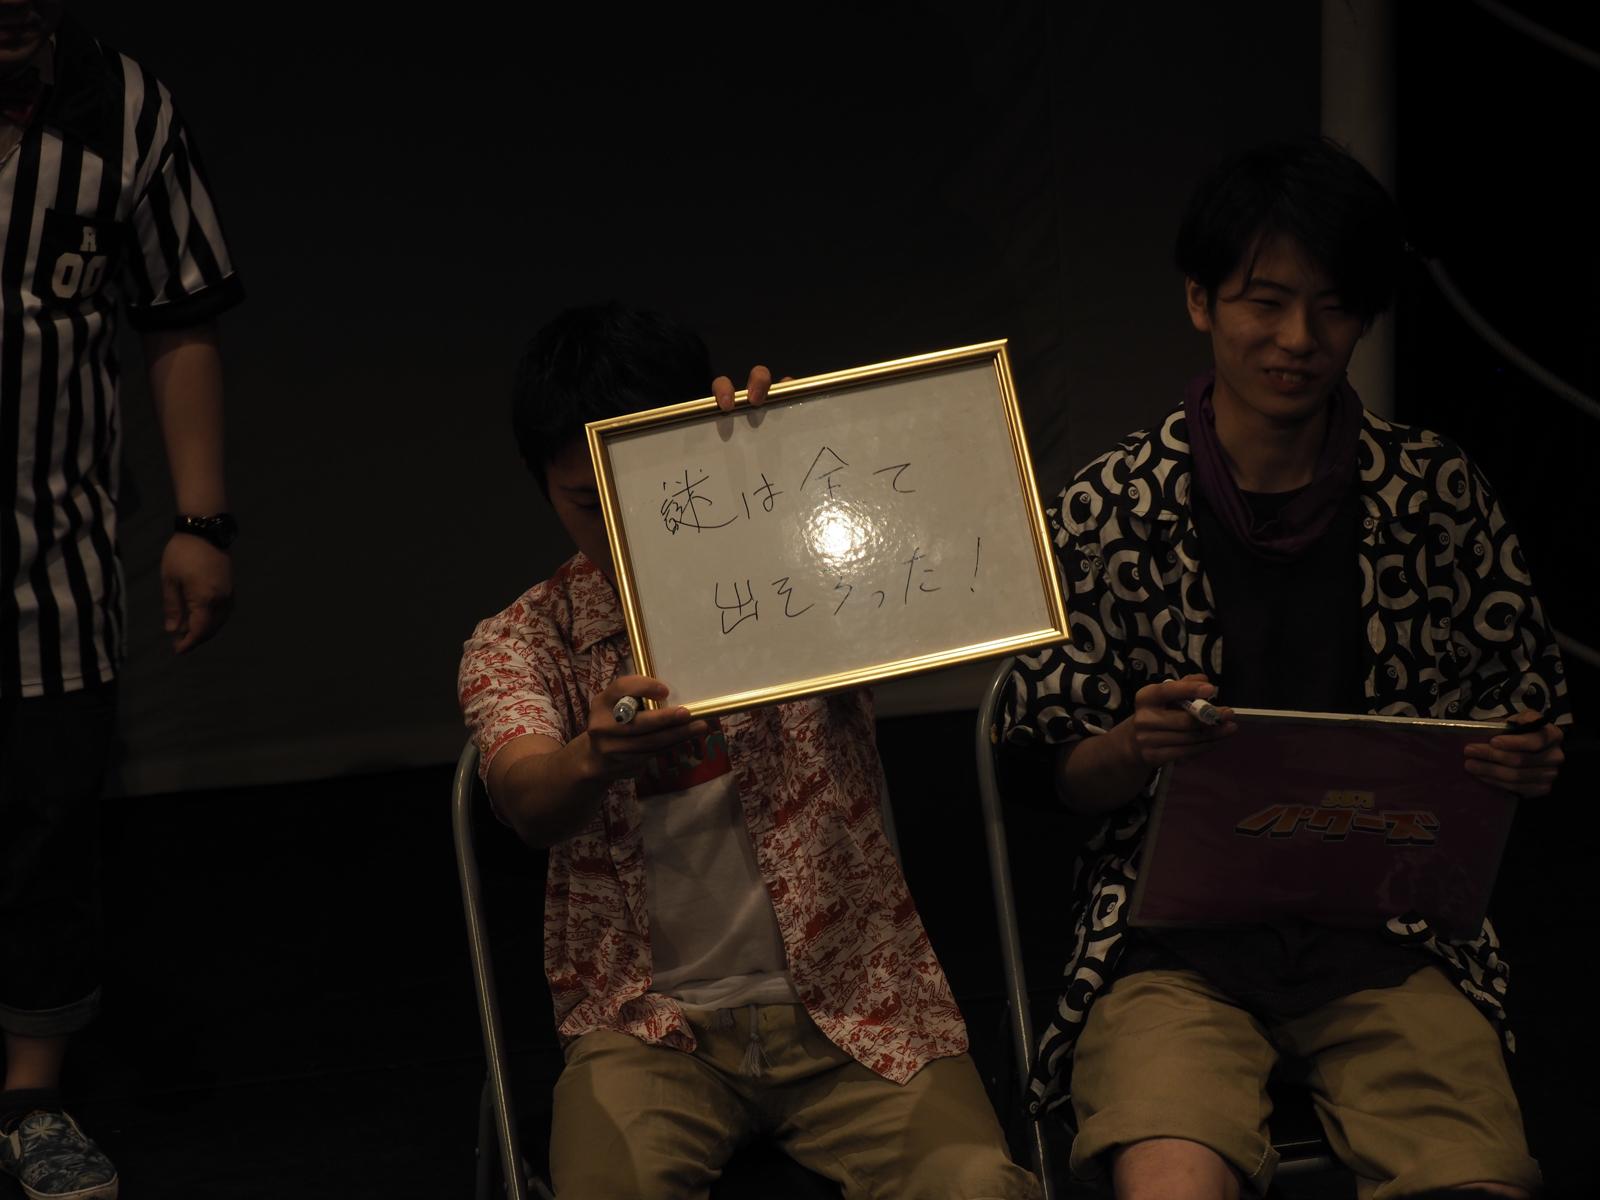 f:id:motomachi24:20170507182553j:plain